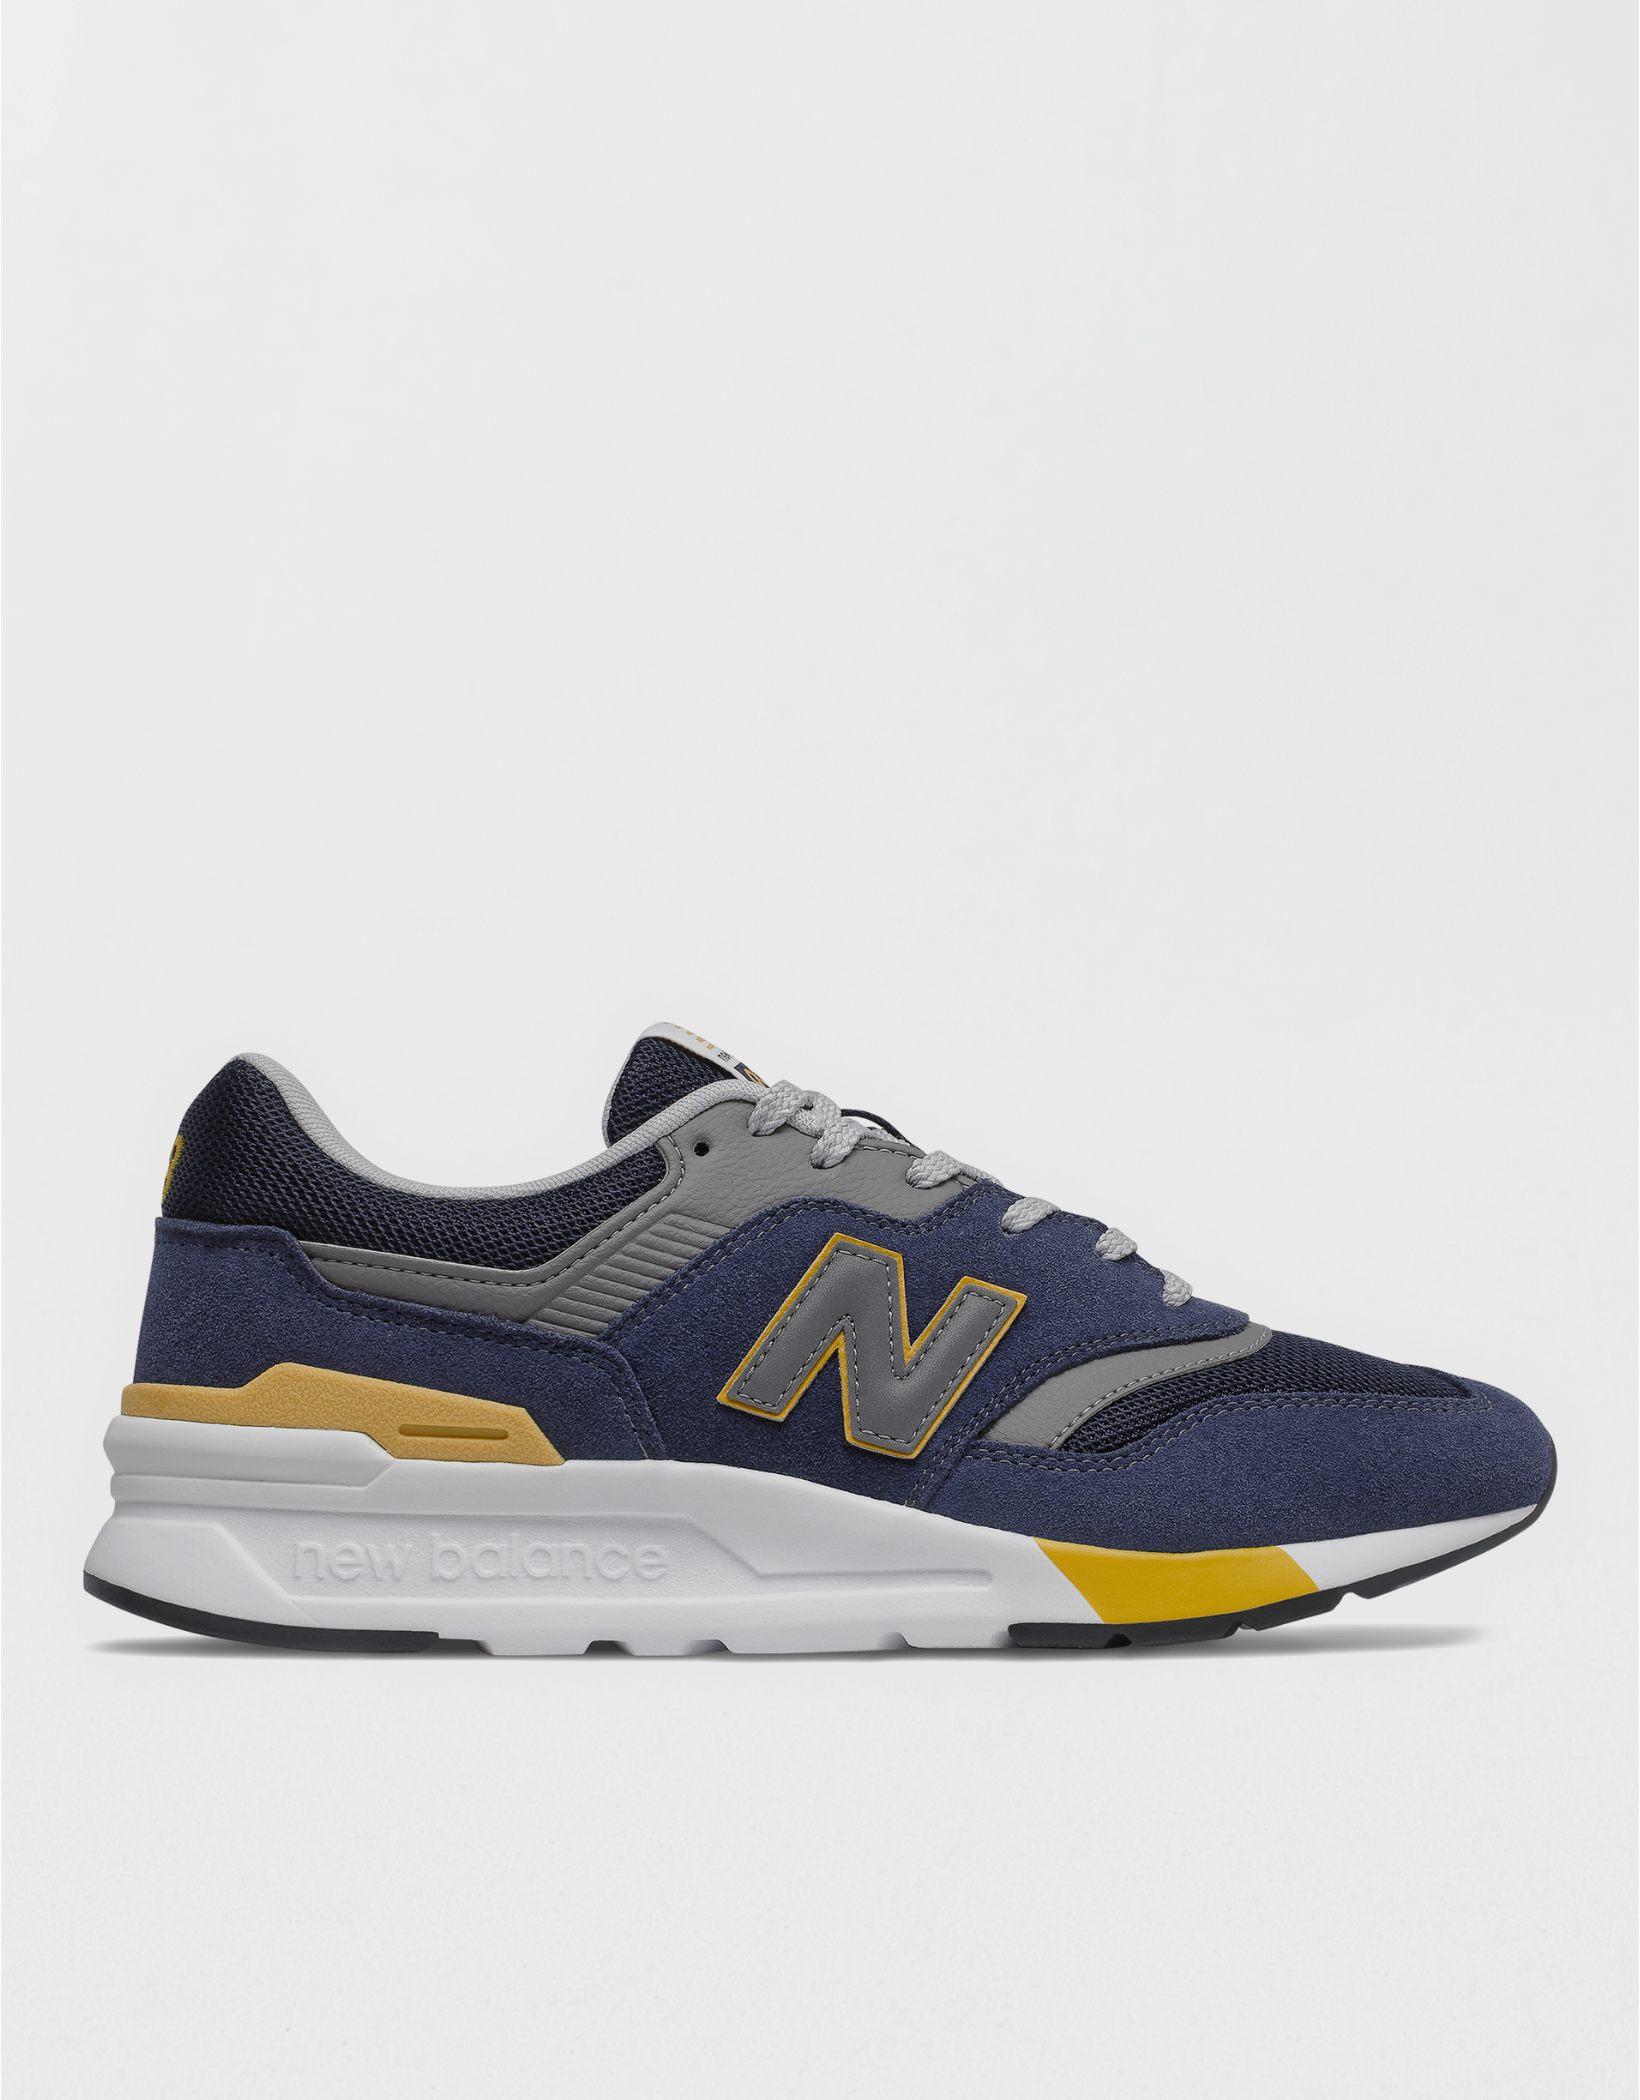 New Balance 997H Sneaker